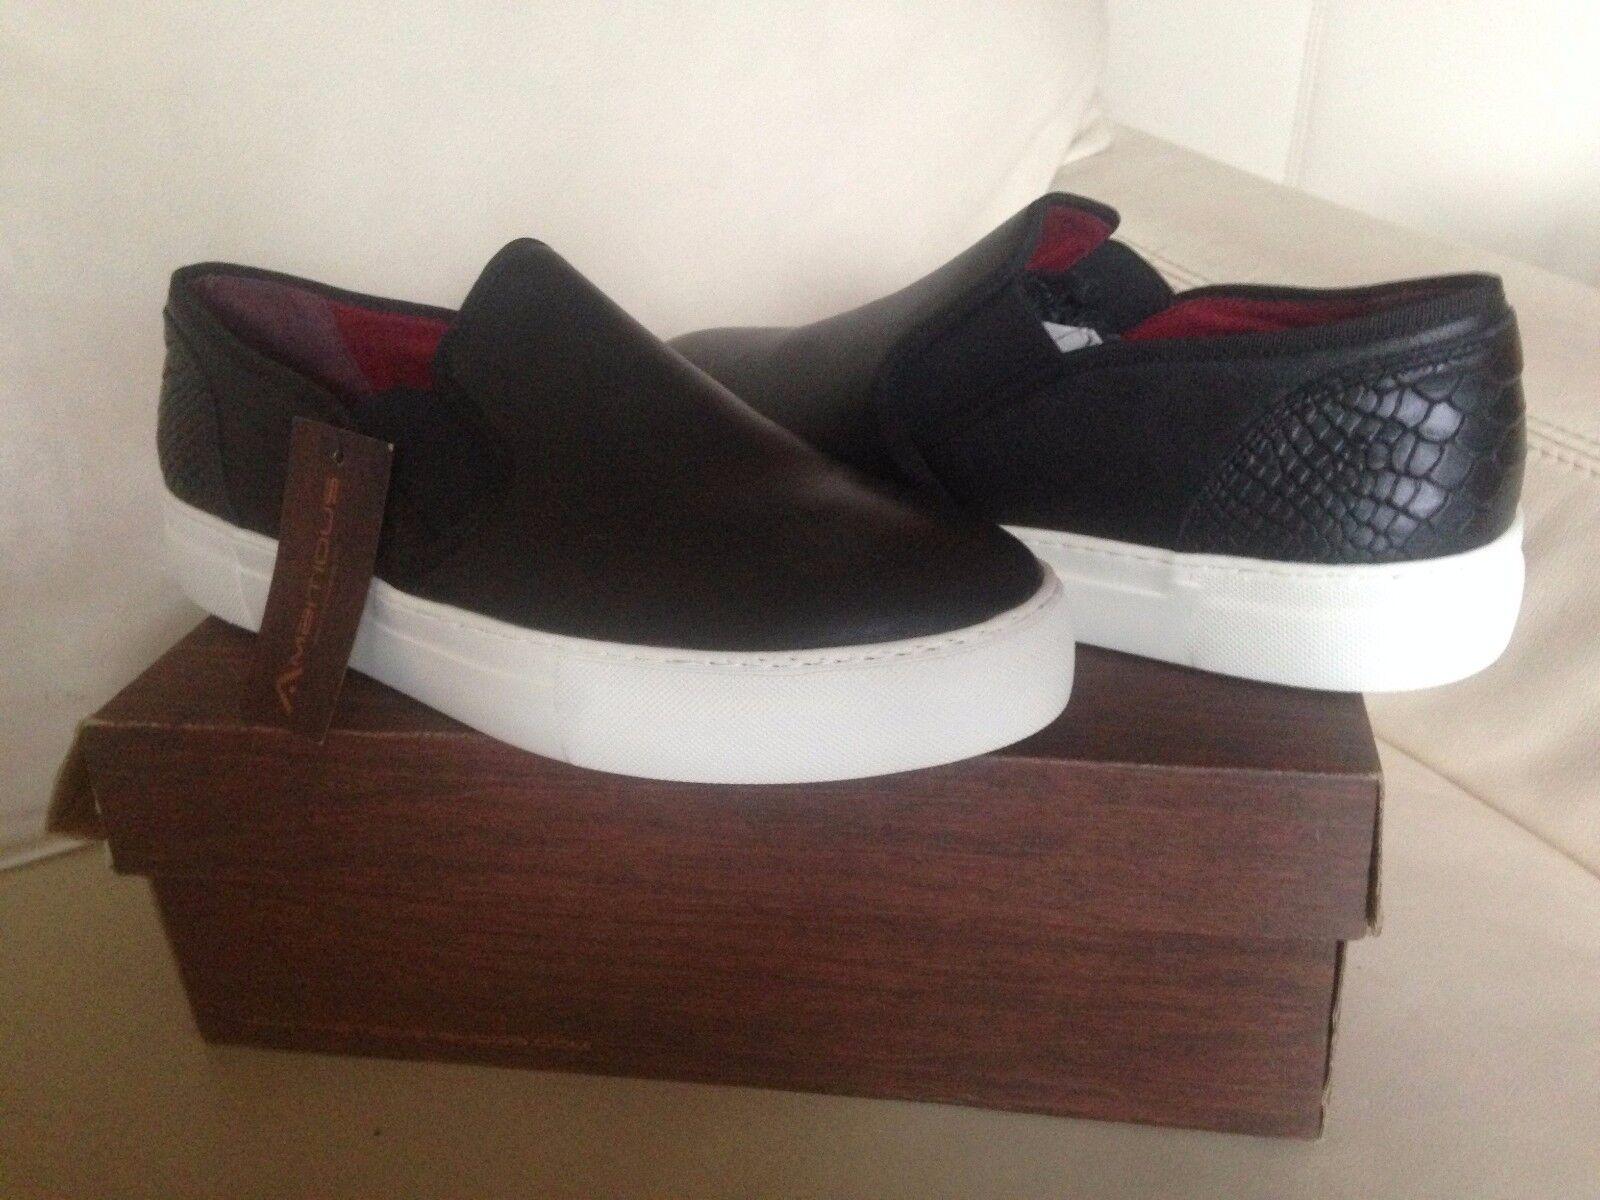 BMBITIOUS Schuhe Sneaker Schlüpfen NEU 45 Herrenschuhe Lederschuhe Black Schous